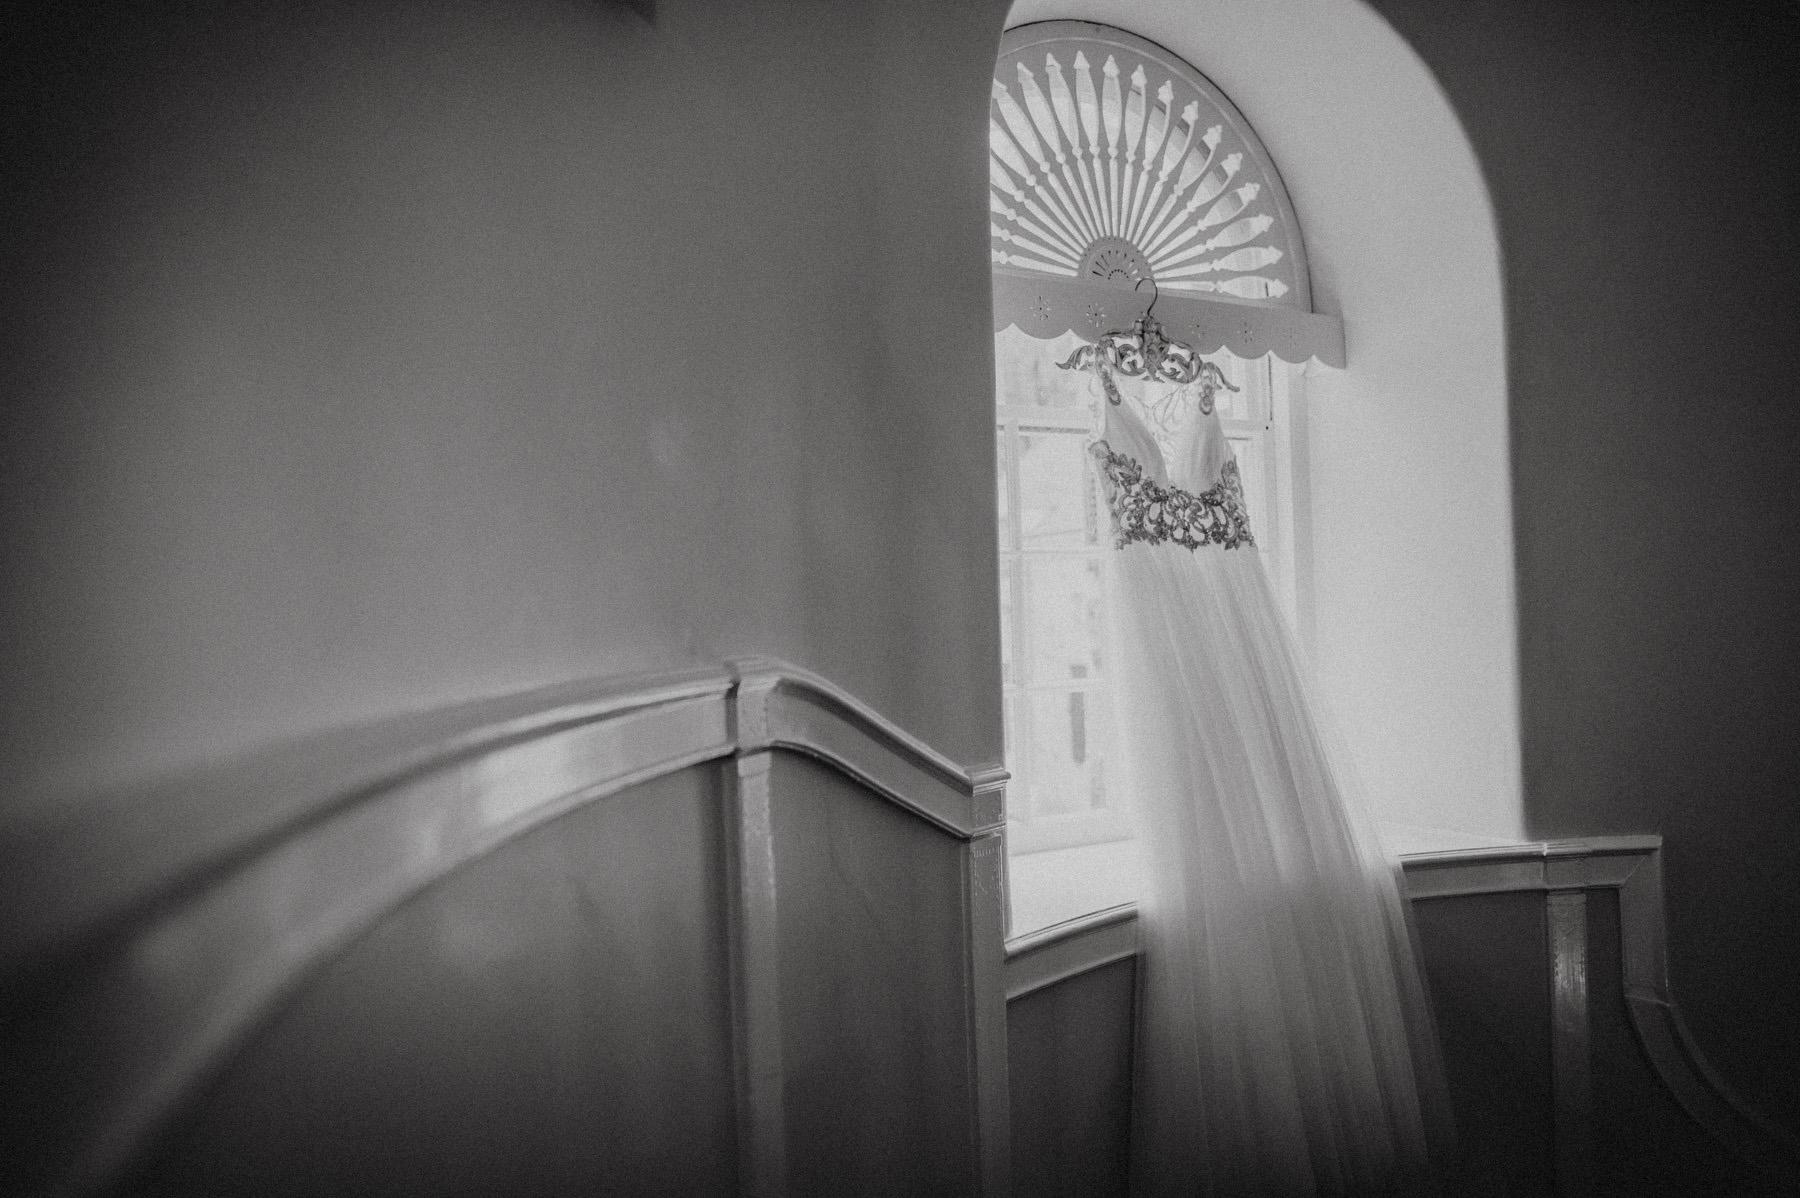 095-appleford-estate-wedding-3.jpg